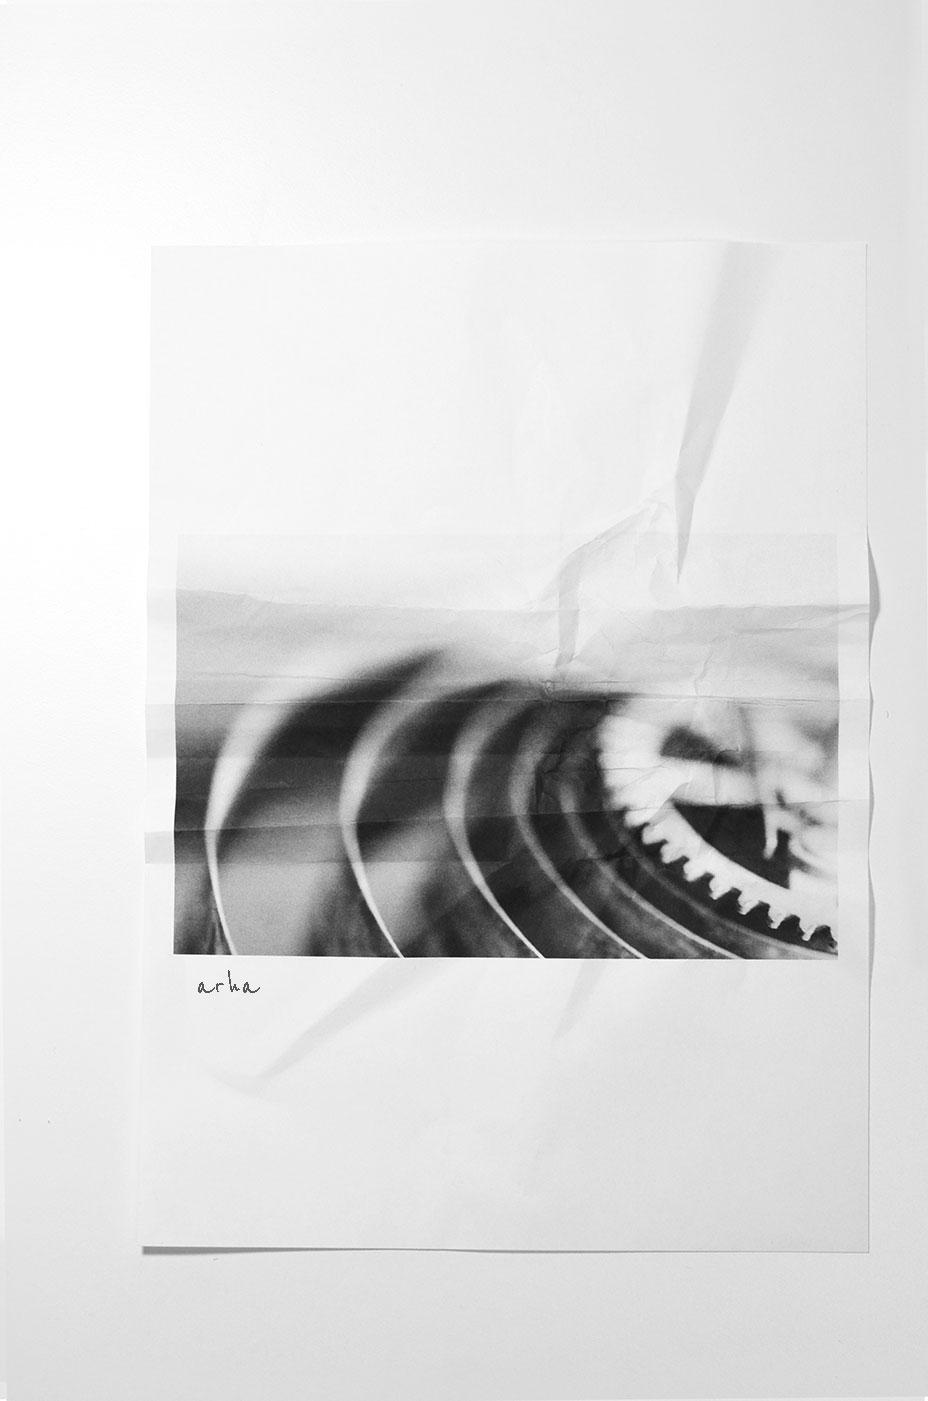 time-memory-minimalism-copyright-2013-arha-Tomomichi-Morifuji